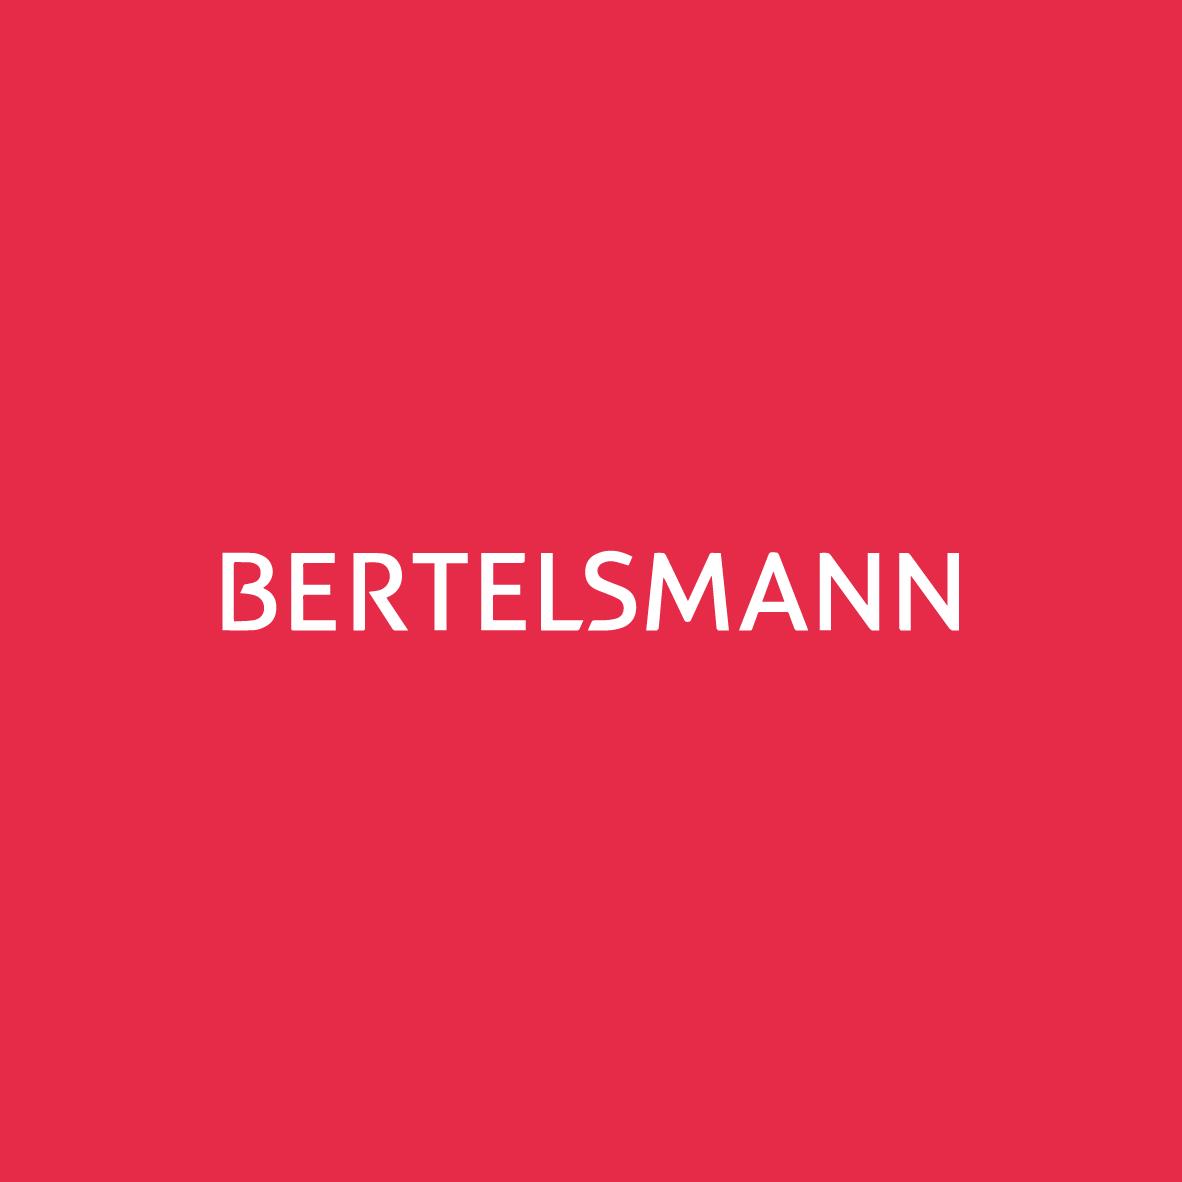 11_BERTELSMANN.png